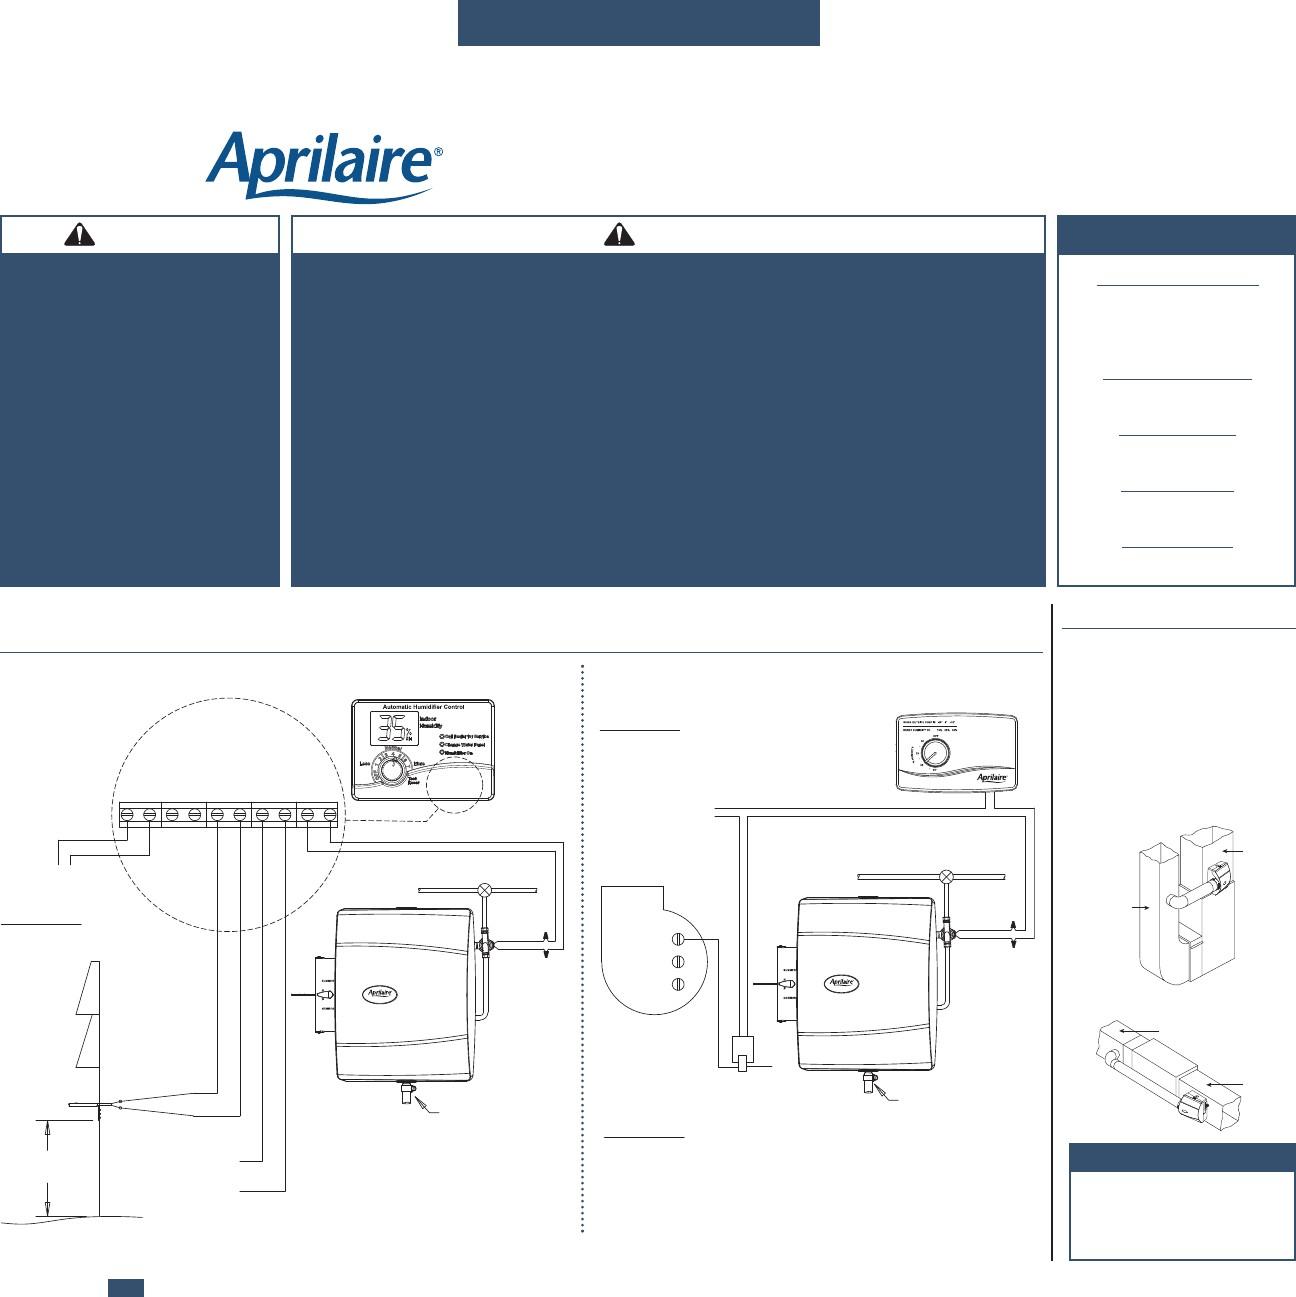 Aprilaire 600 Wiring Diagram Tempstar - Find Wiring Diagram •